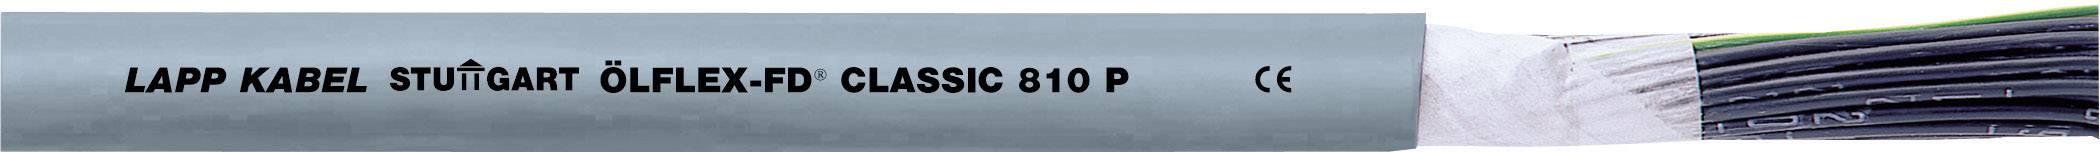 Tažný kabel LappKabel ÖLFLEX® FD CLASSIC 810 P 5G1 (0026333), 5x 1 mm², polyurethan, Ø 8,5 mm, nestíněný, 1 m,